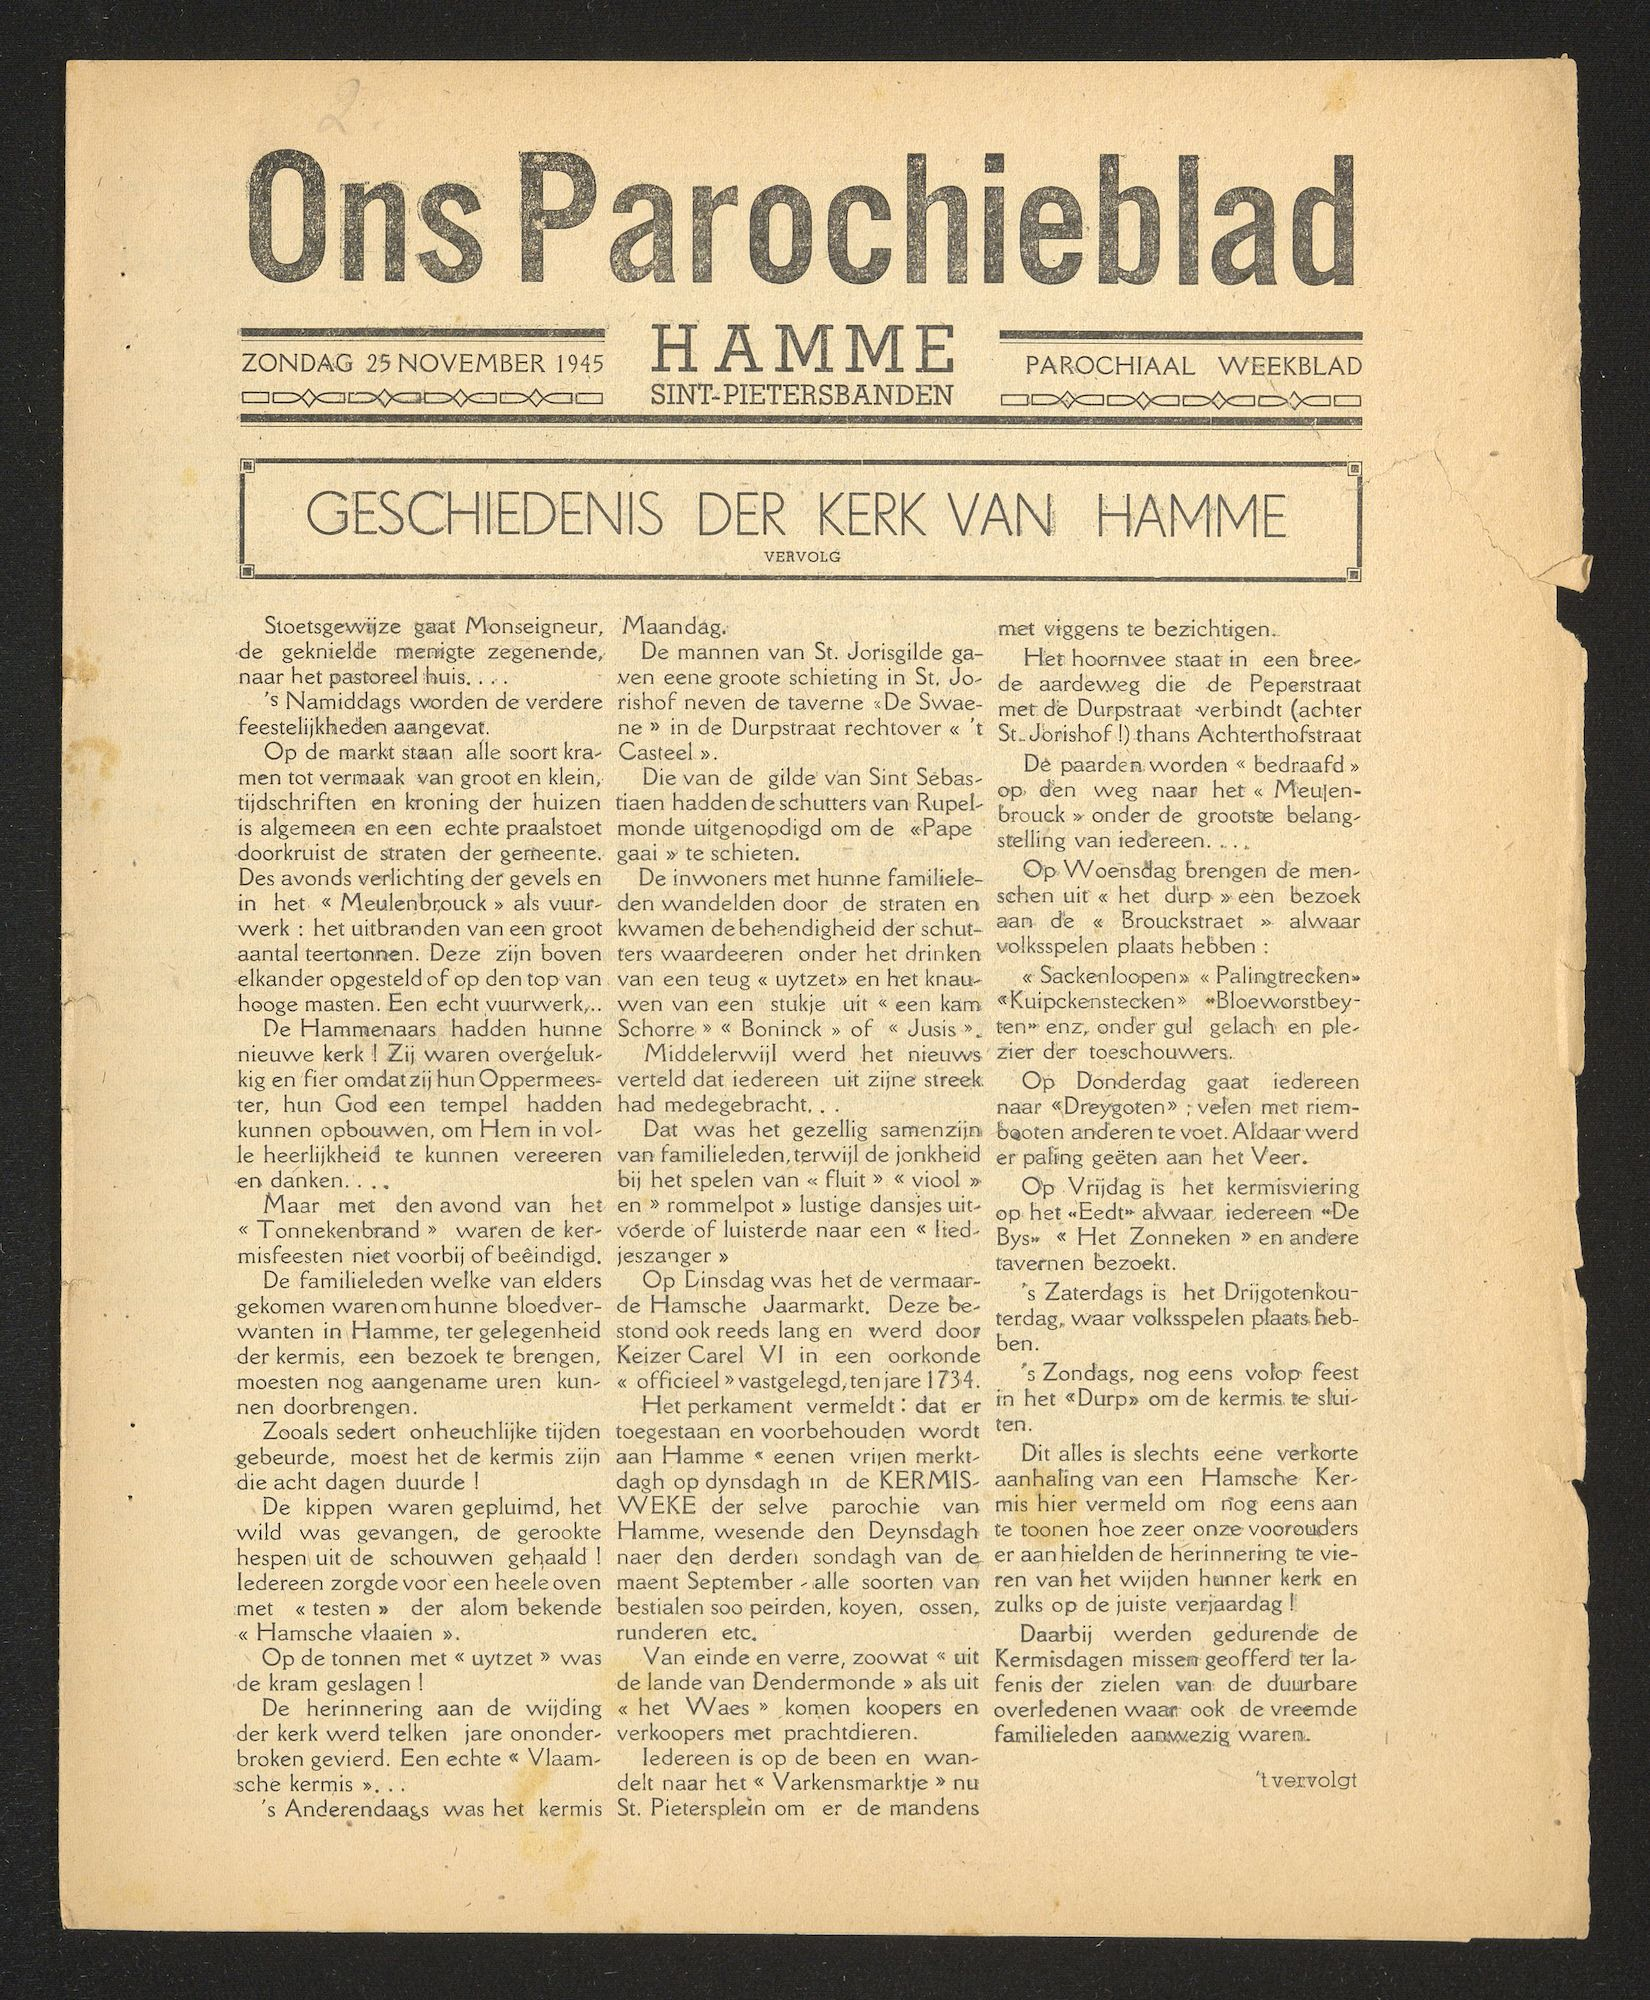 ONS PAROCHIEBLAD 1945-11-25 p1